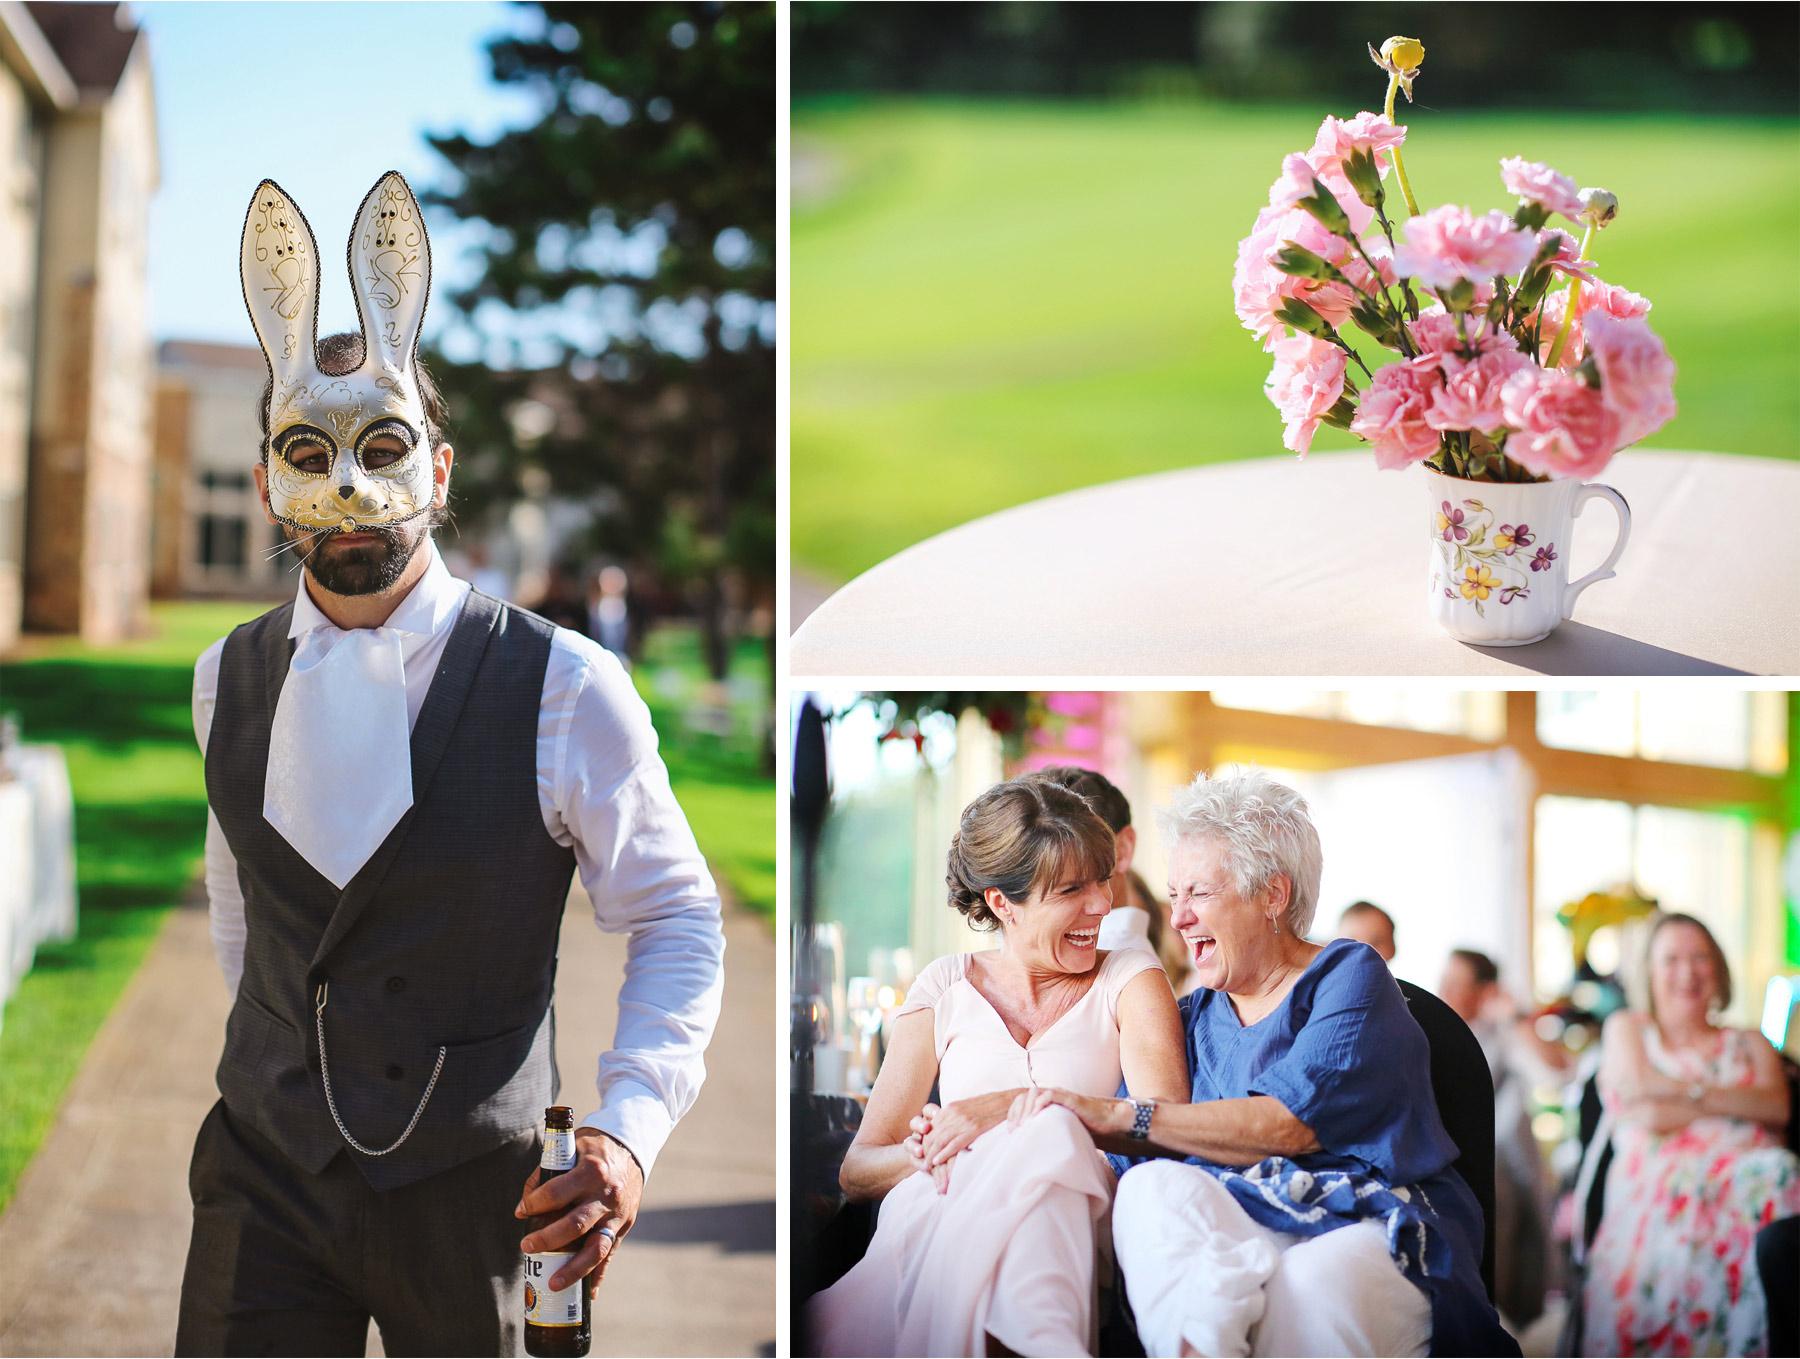 21-Vick-Photography-Wedding-Ottertail-Minnesota-Alice-in-Wonderland-Theme-Reception-Table-Decor-Teacup-White-Rabit-Tess-and-Greg.jpg